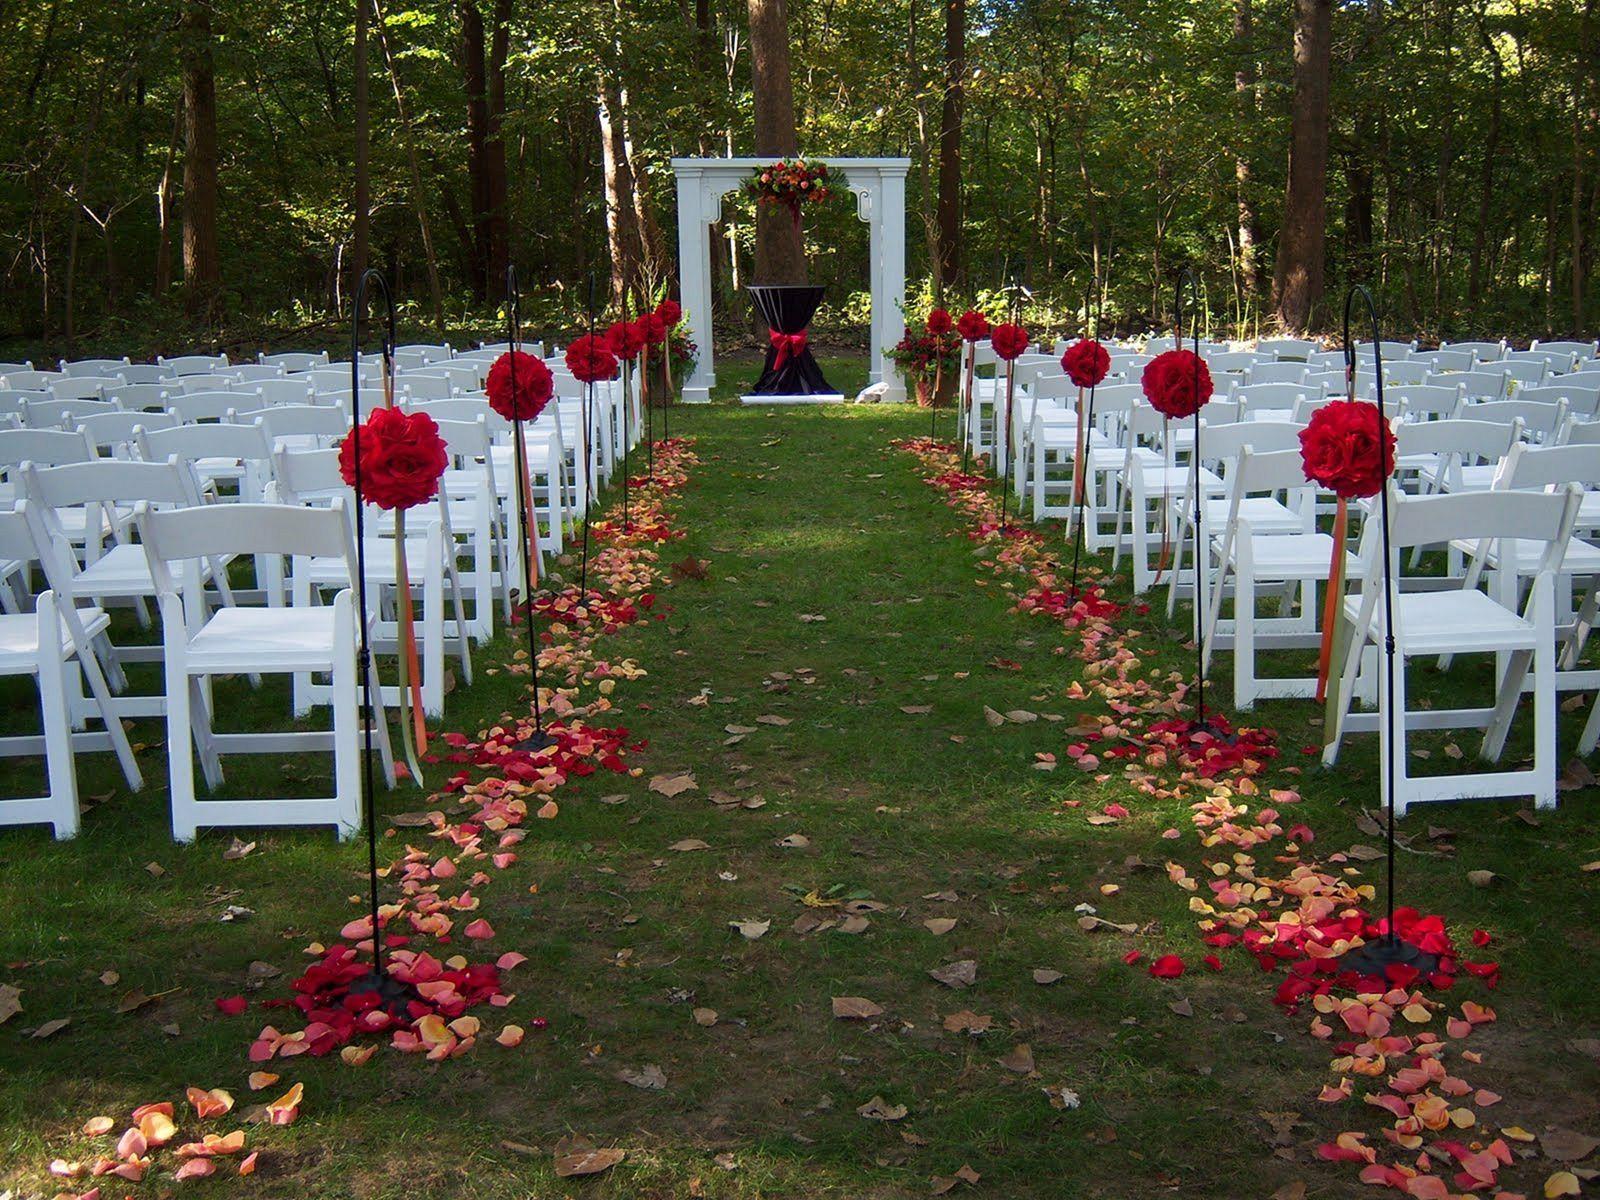 55 best backyard wedding decoration ideas on a budget wedding nice 55 best backyard wedding decoration ideas on a budget httpsoosile55 best backyard wedding decoration ideas on a budget 5105 junglespirit Gallery